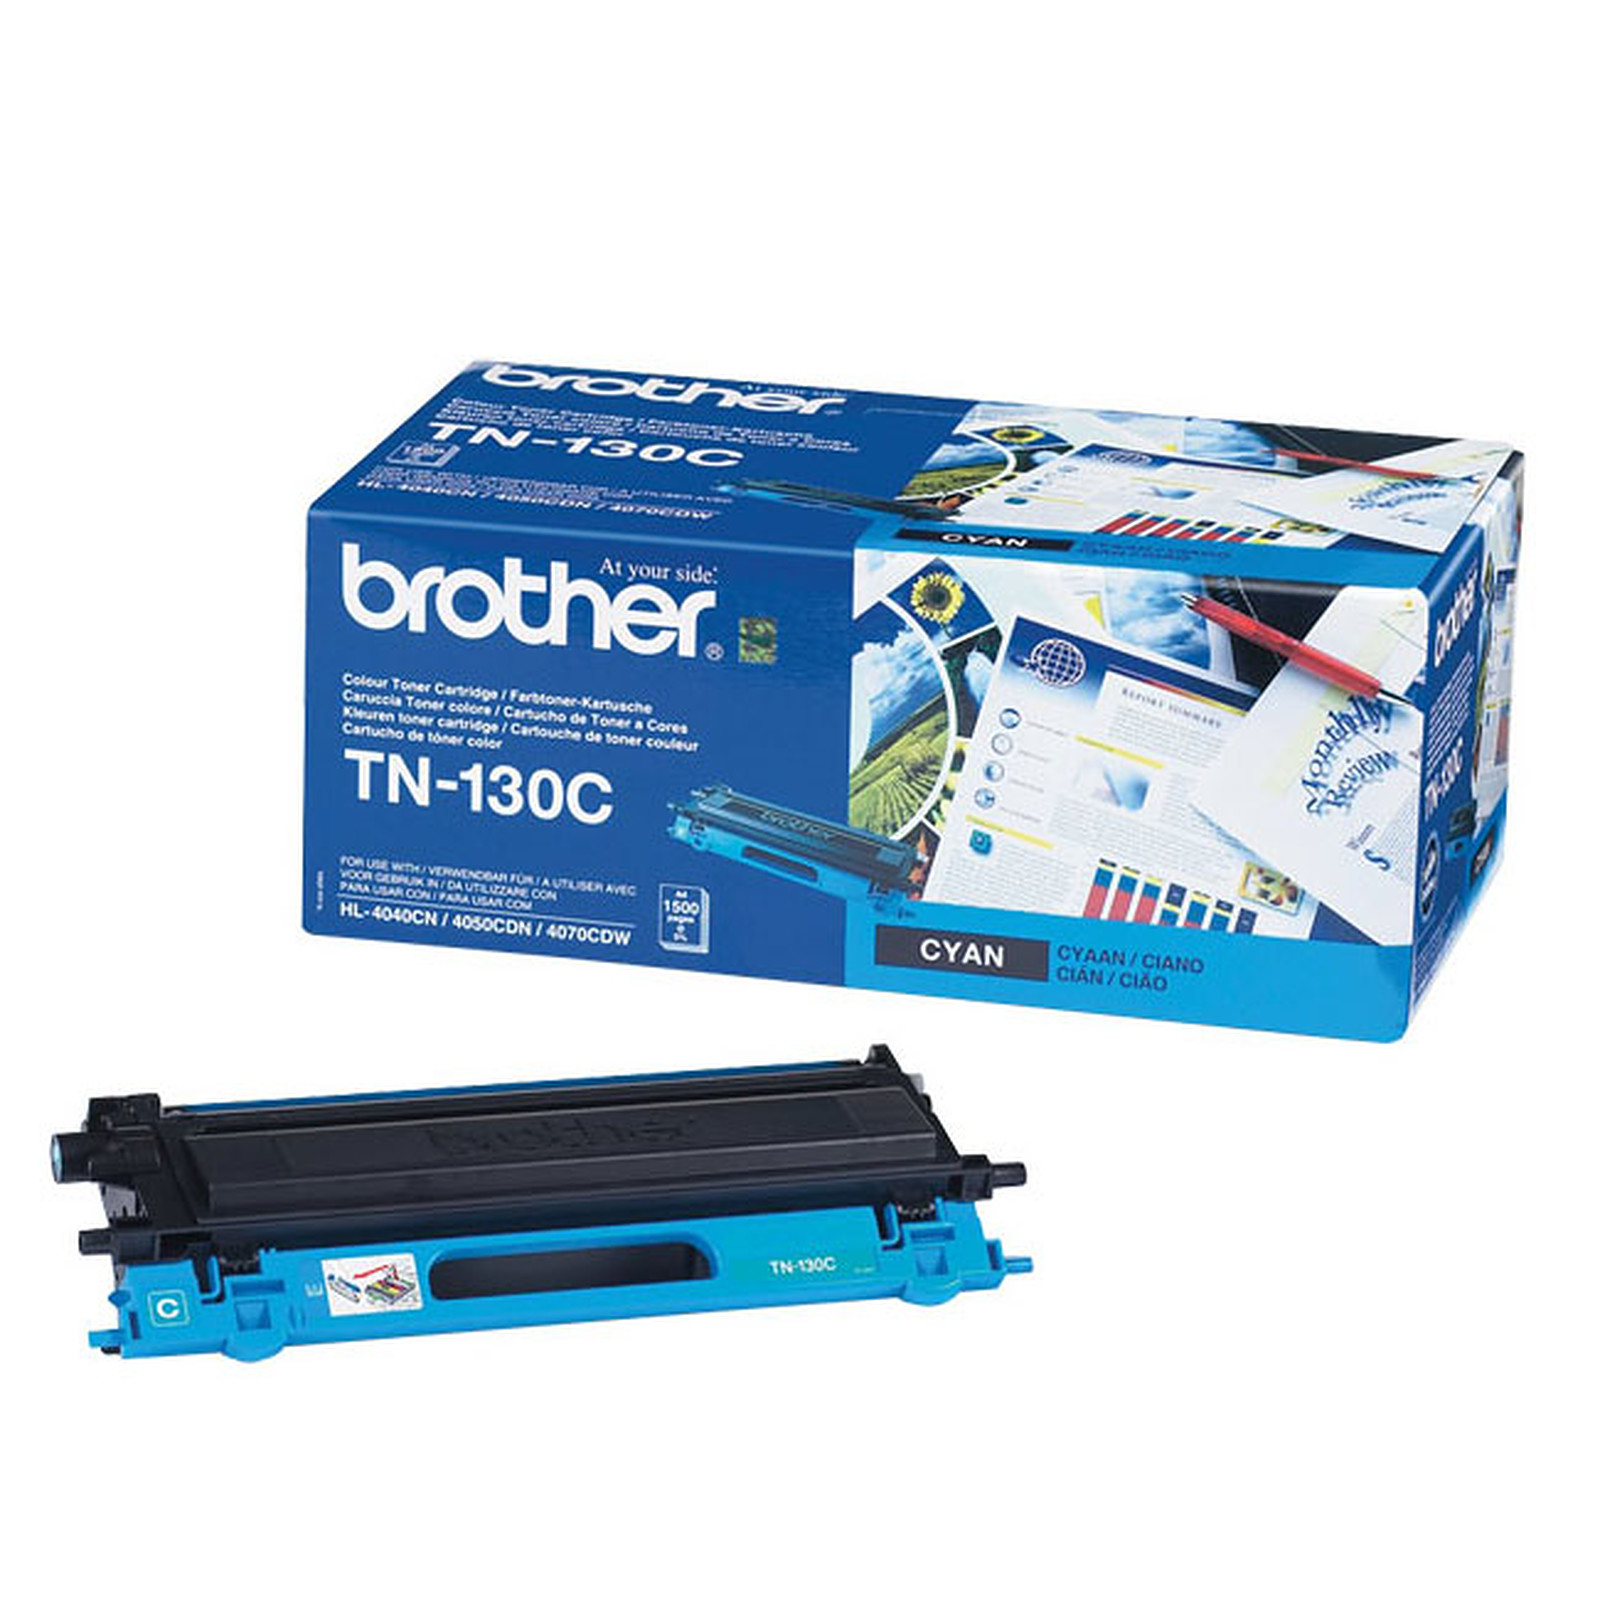 Brother TN-130C (Cyan)